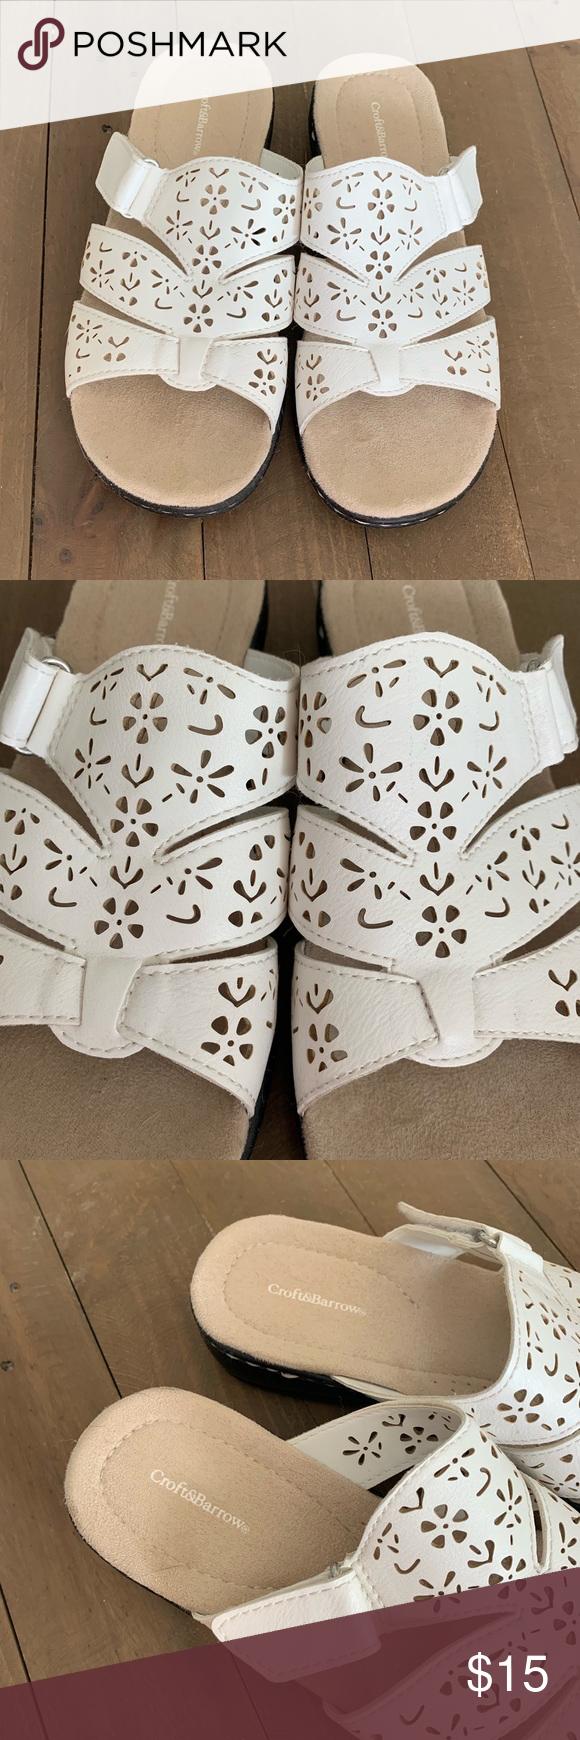 White Croft \u0026 Barrow Sandals with, Size